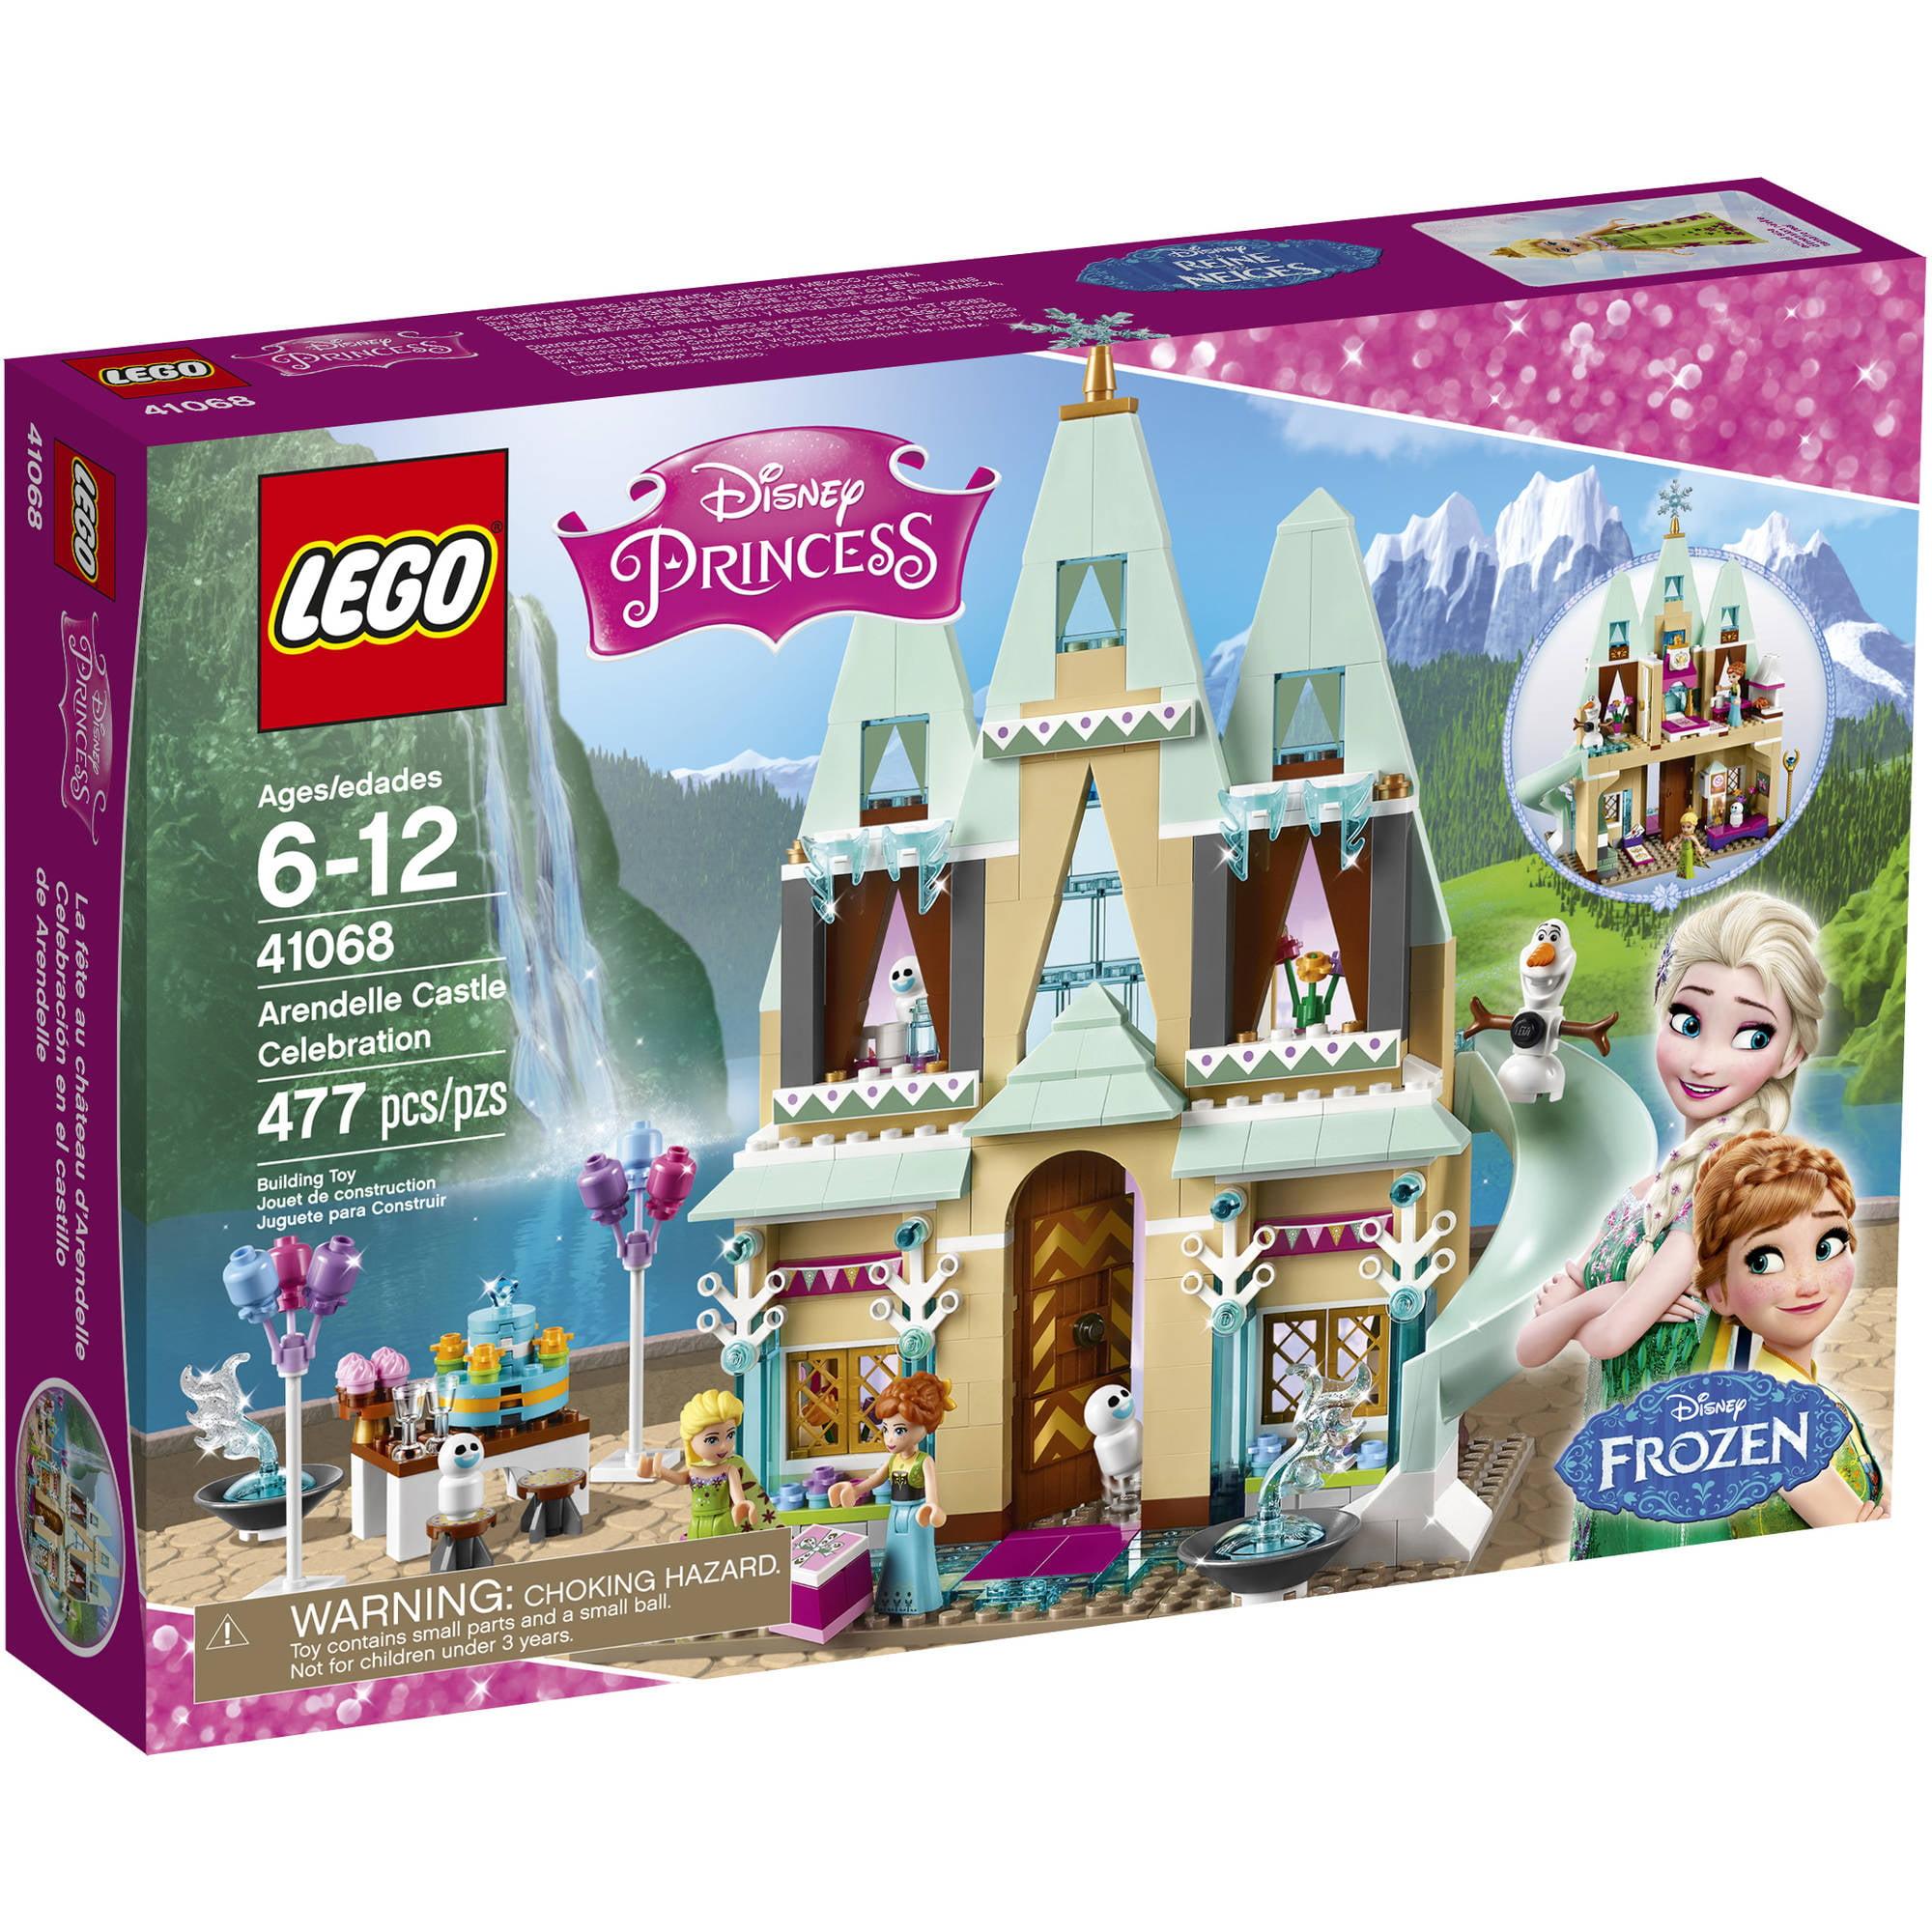 LEGO Disney Princess Arendelle Castle Celebration, 41068